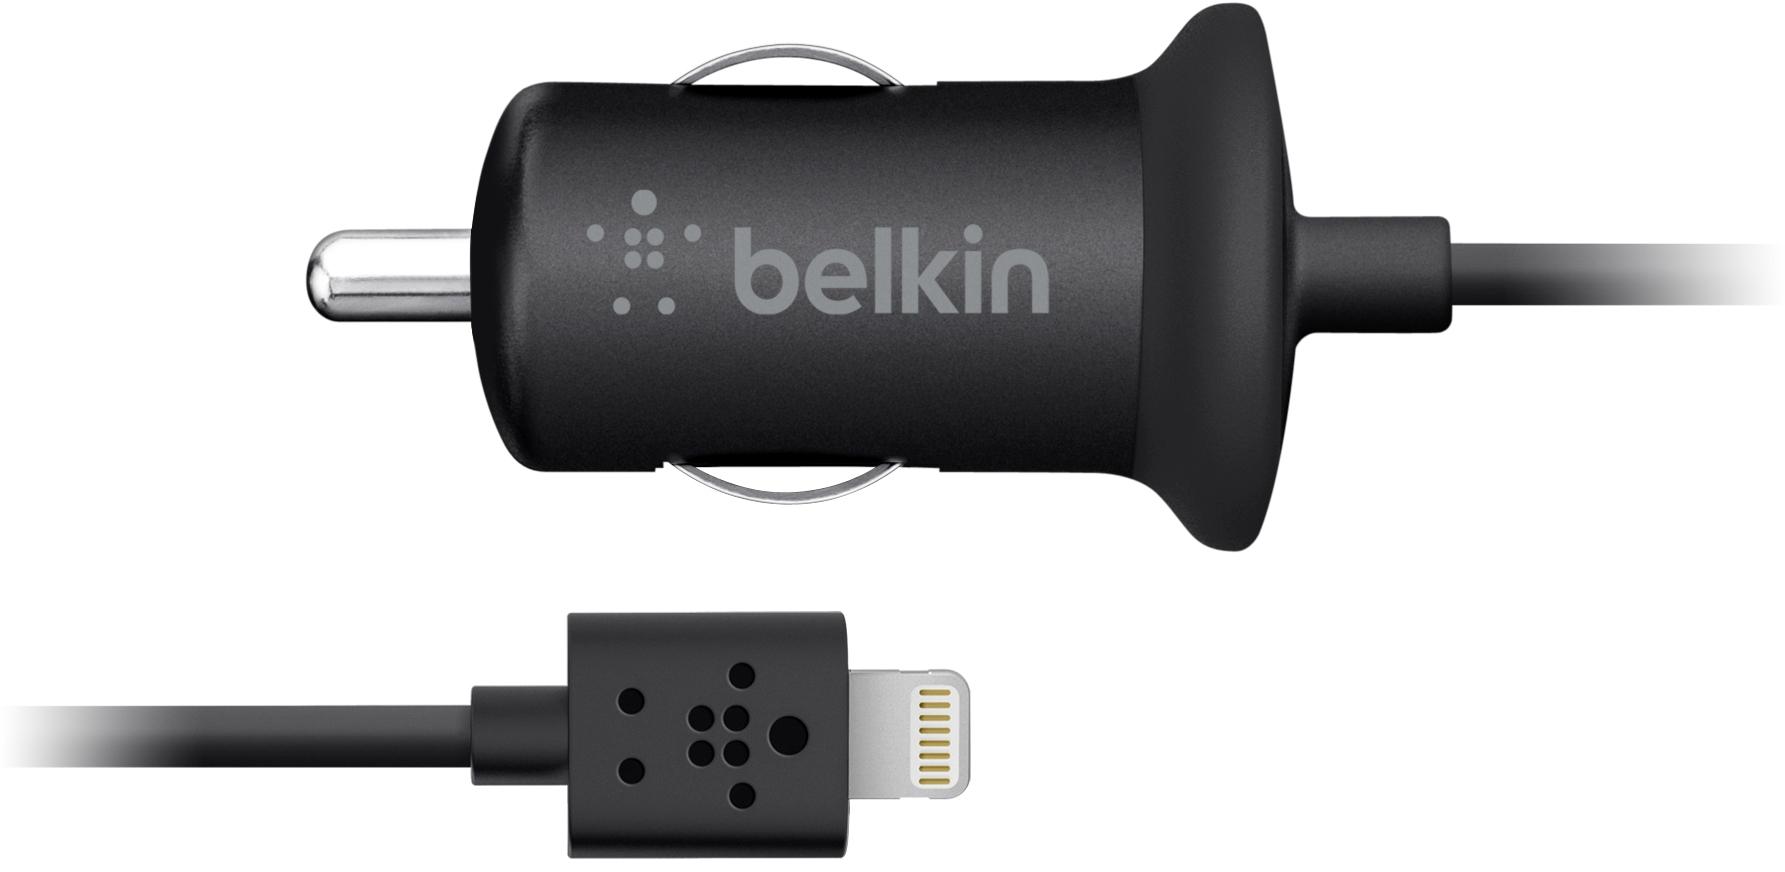 Belkin - Car Charger 2.1 AMP For iPad mini, iPad 4th gen